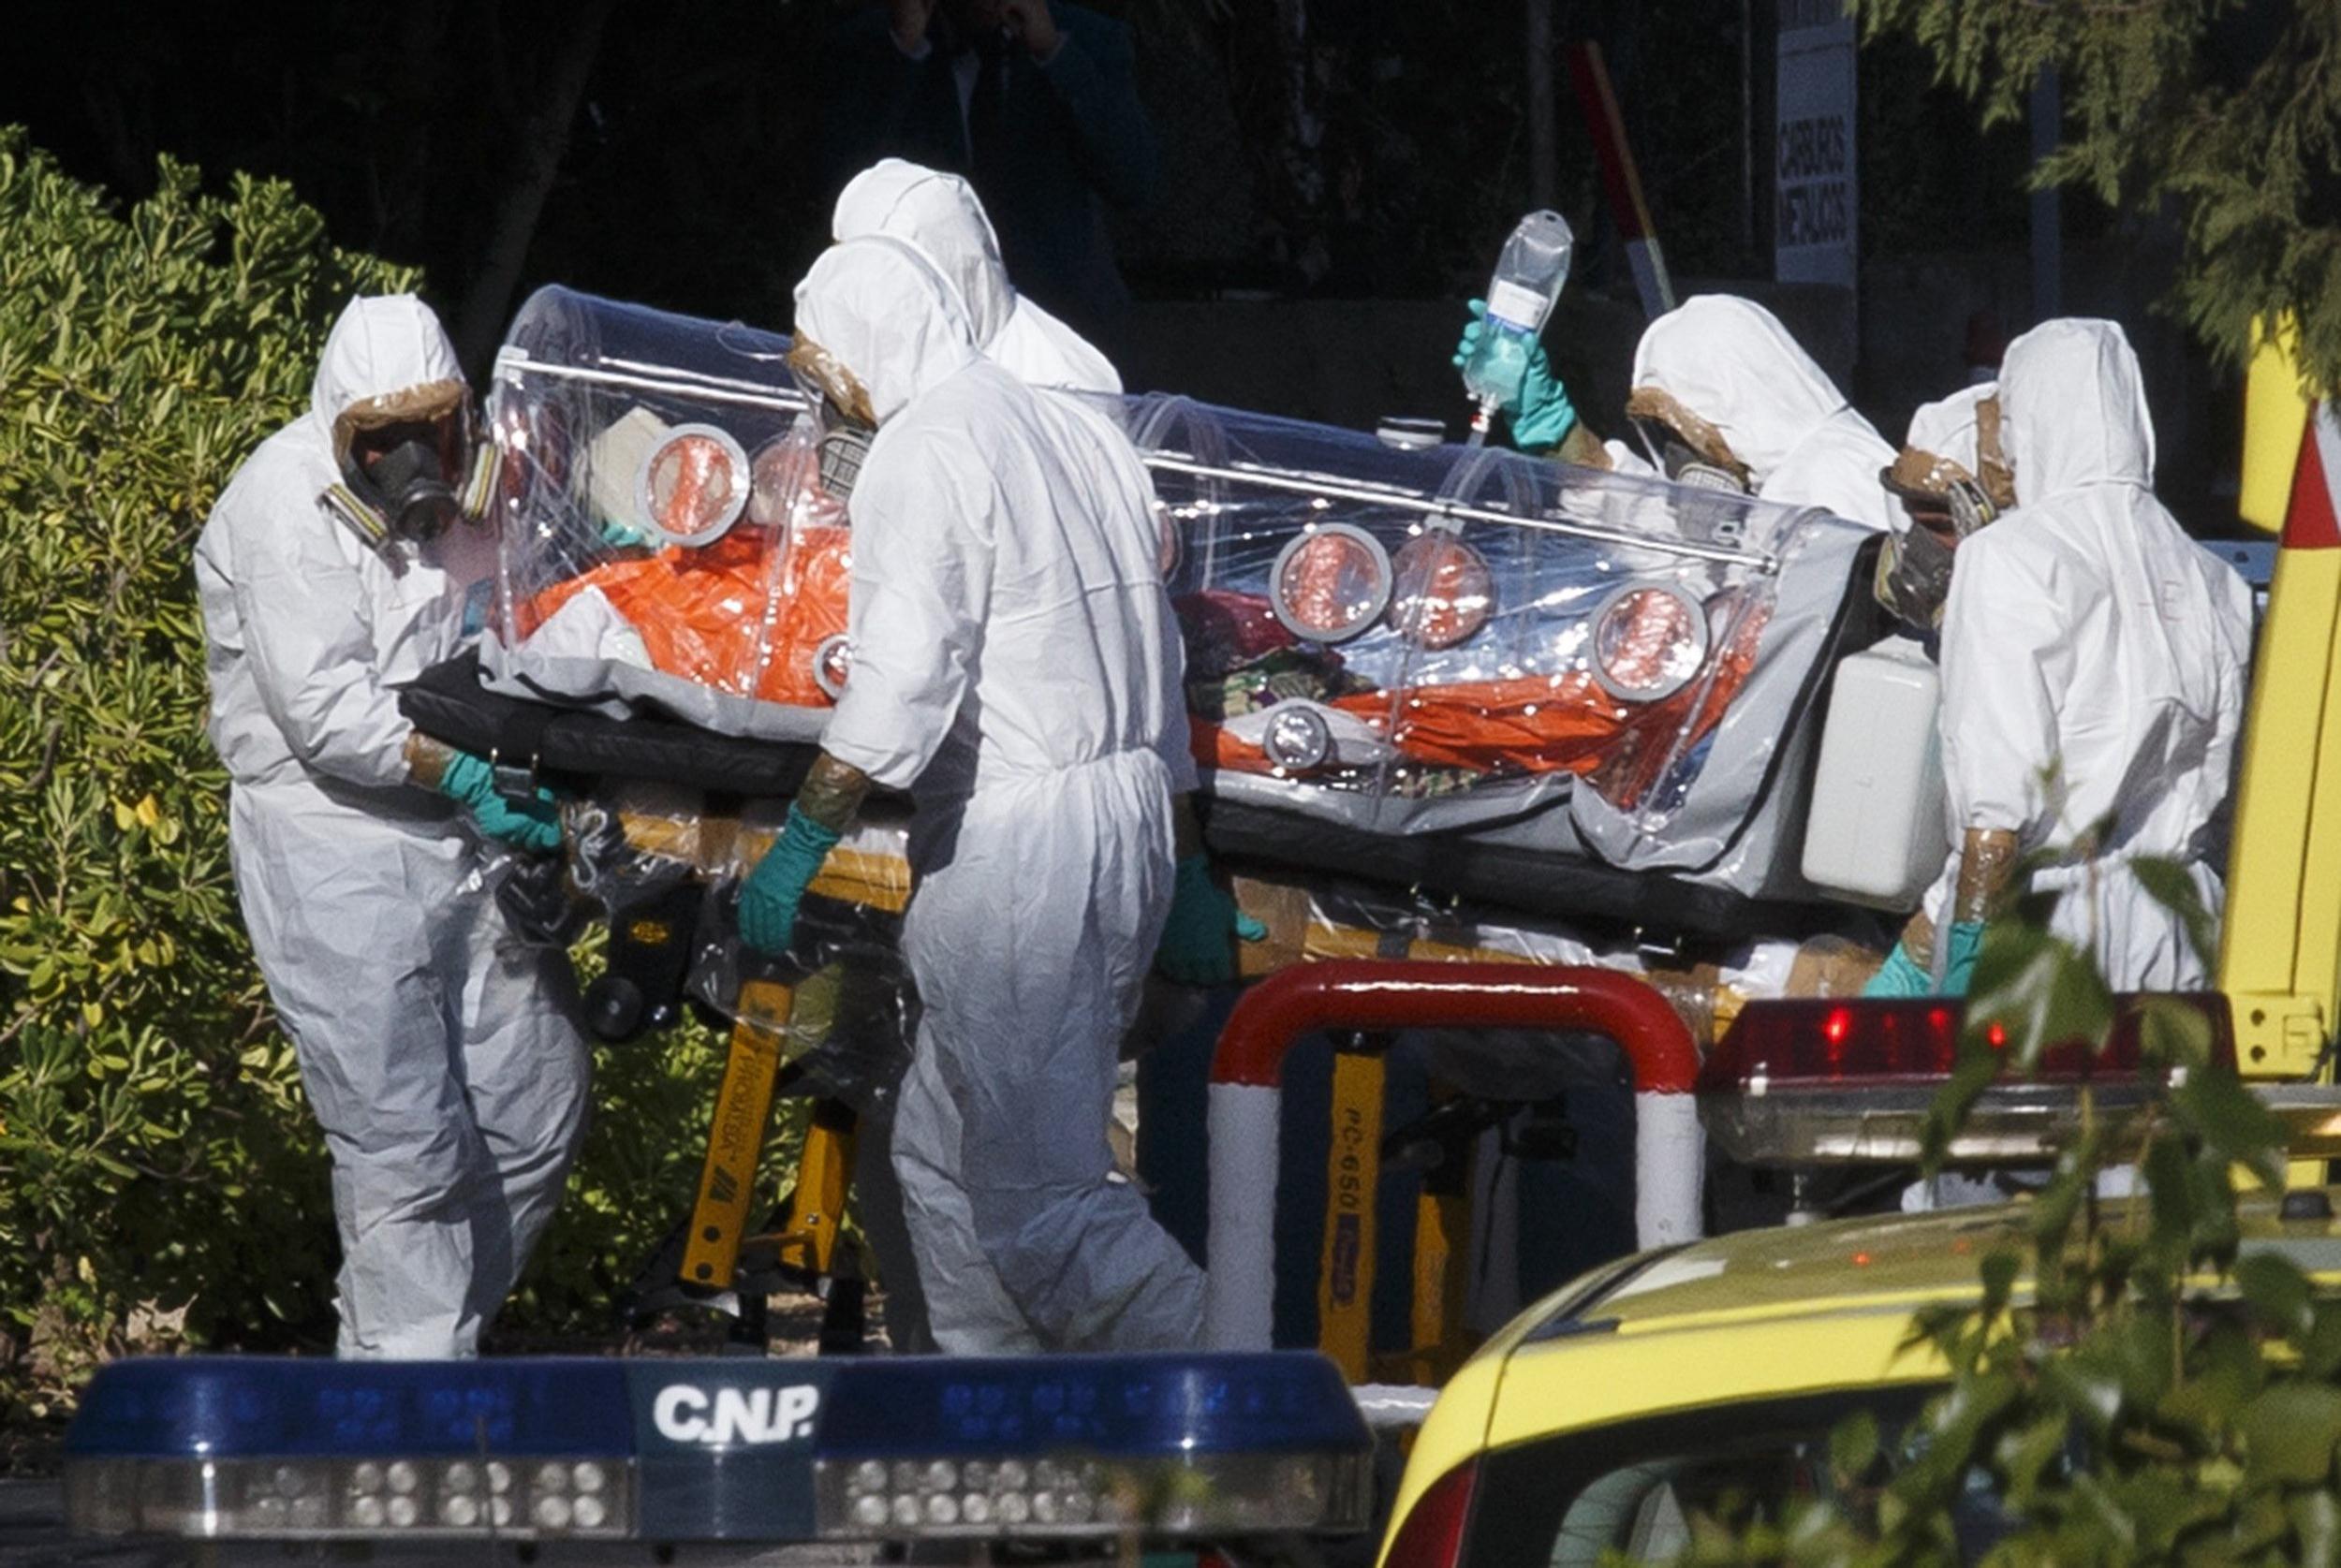 http://media3.s-nbcnews.com/i/newscms/2014_32/605416/140807-ebola-spain-7a_467e254a065a484d2c28f83b36a56d08.jpg